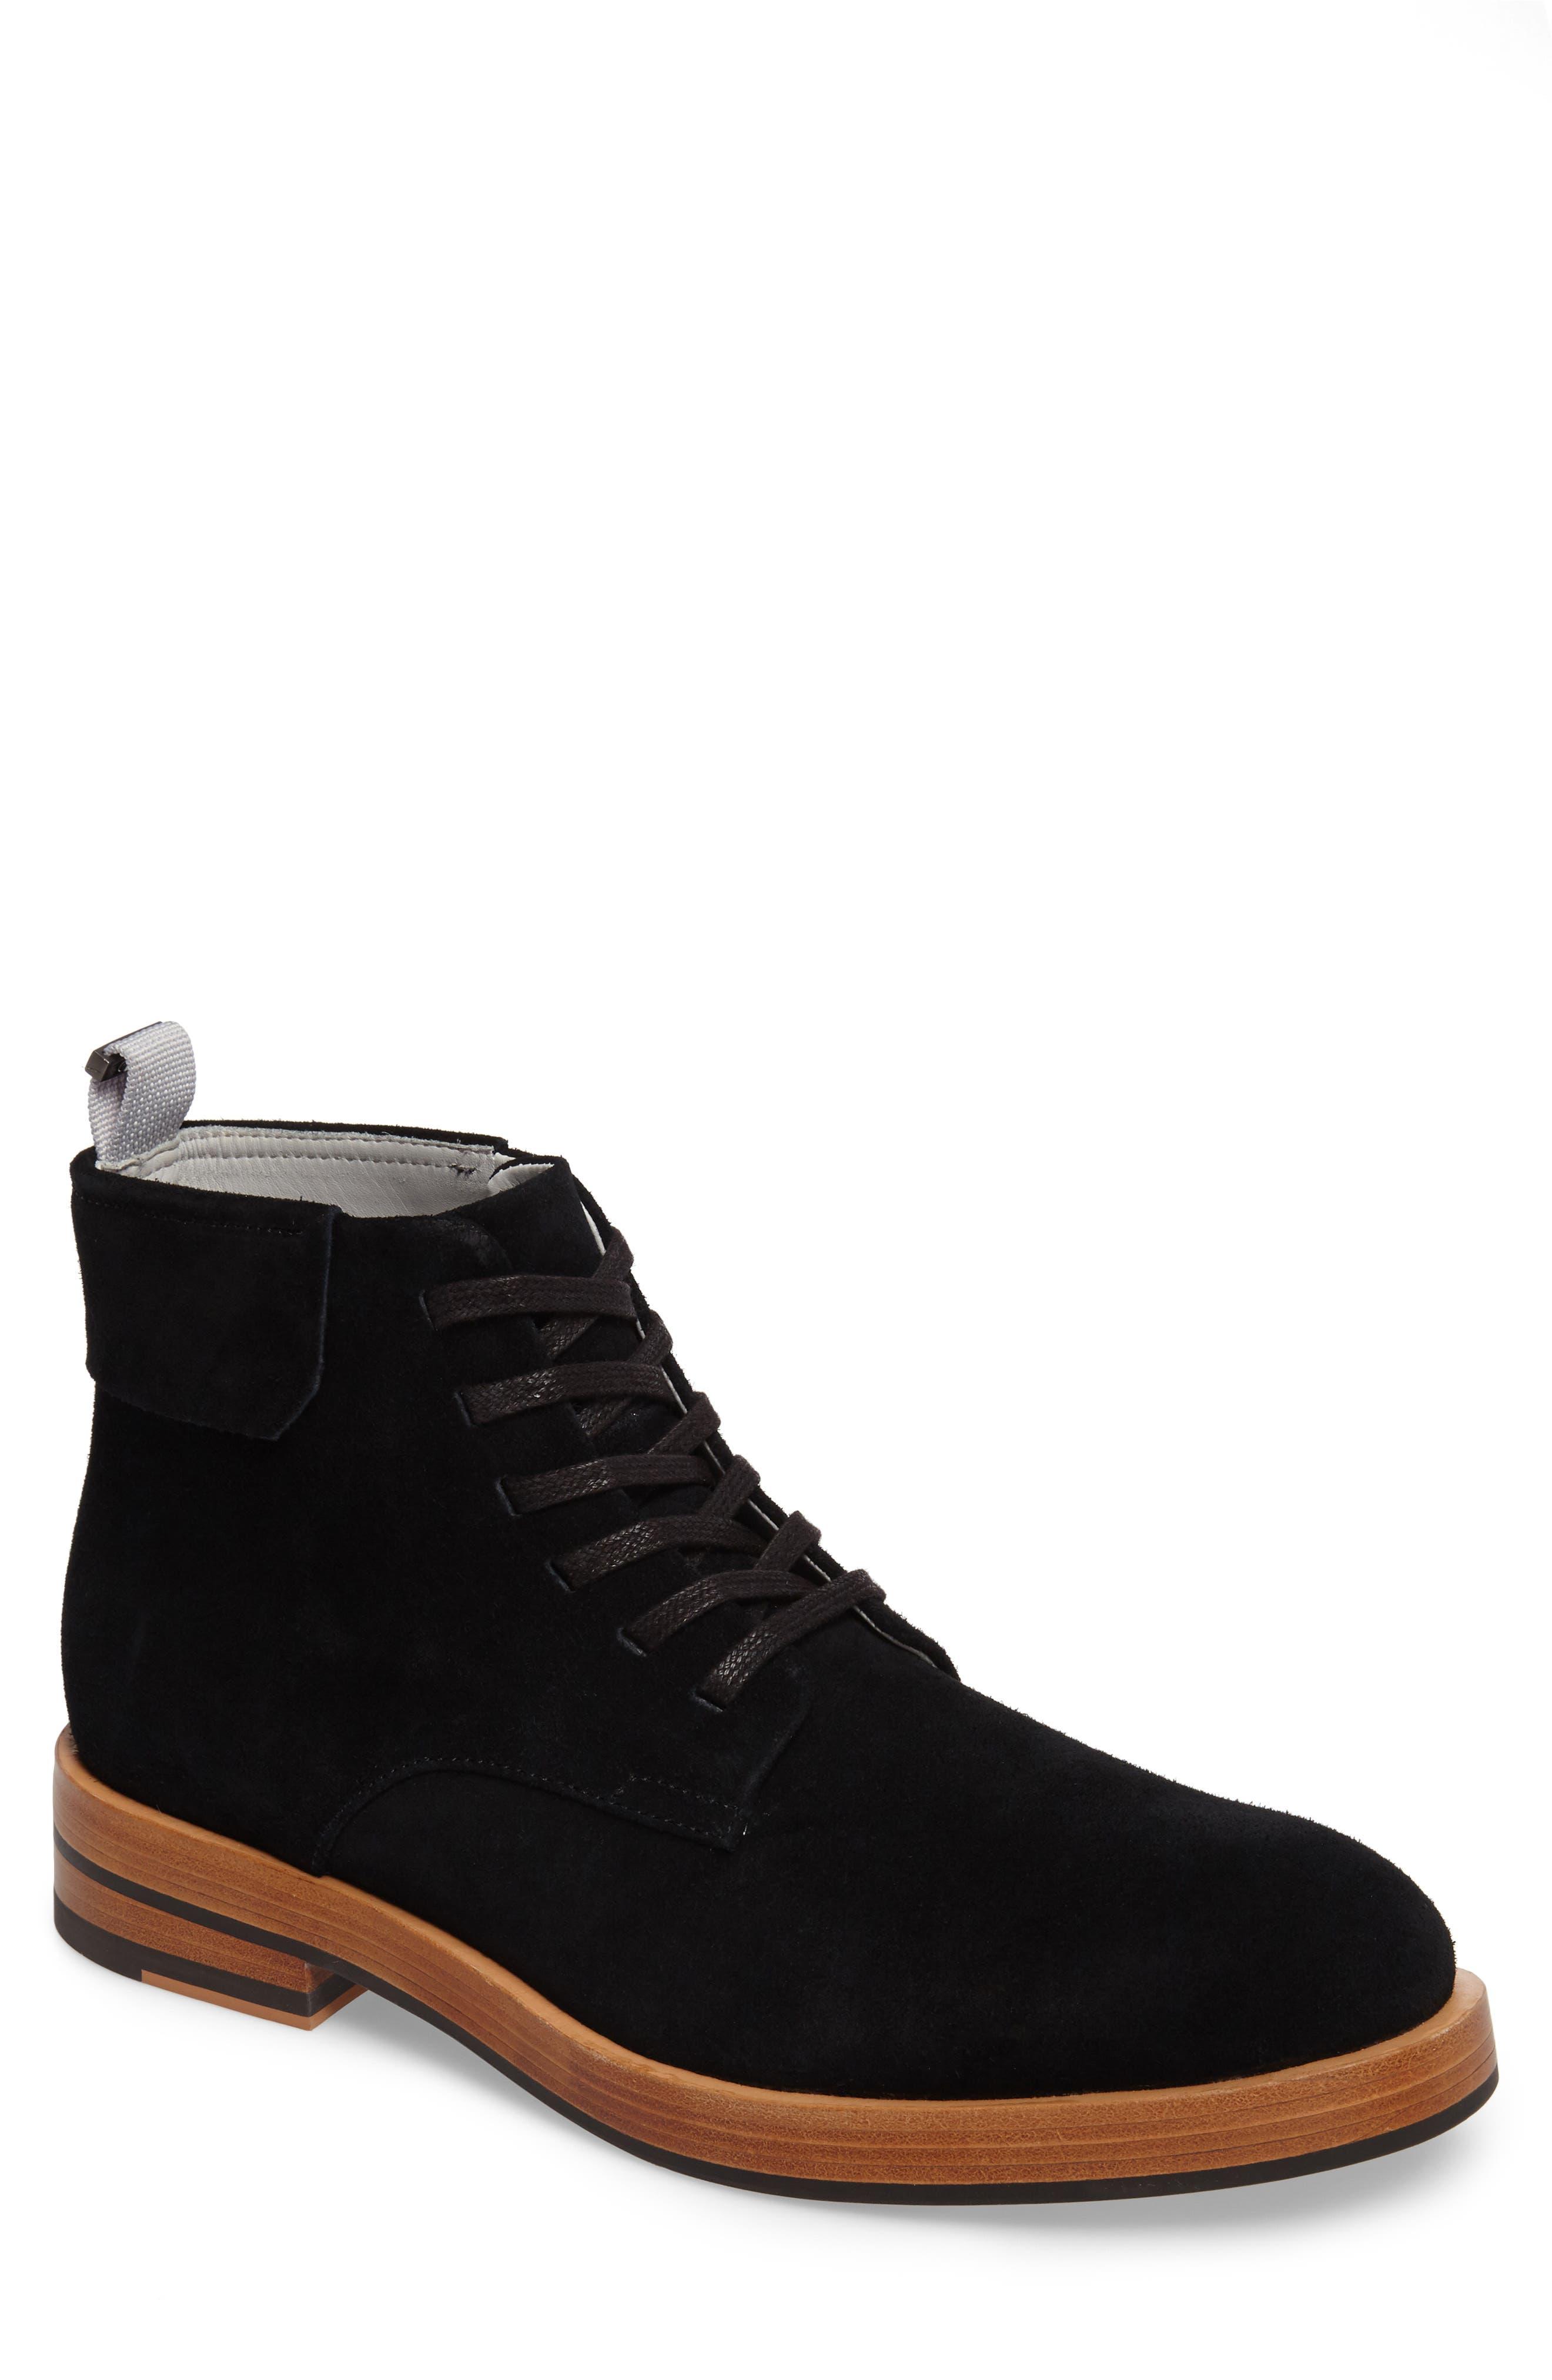 Radburn Plain Toe Boot,                         Main,                         color, 001